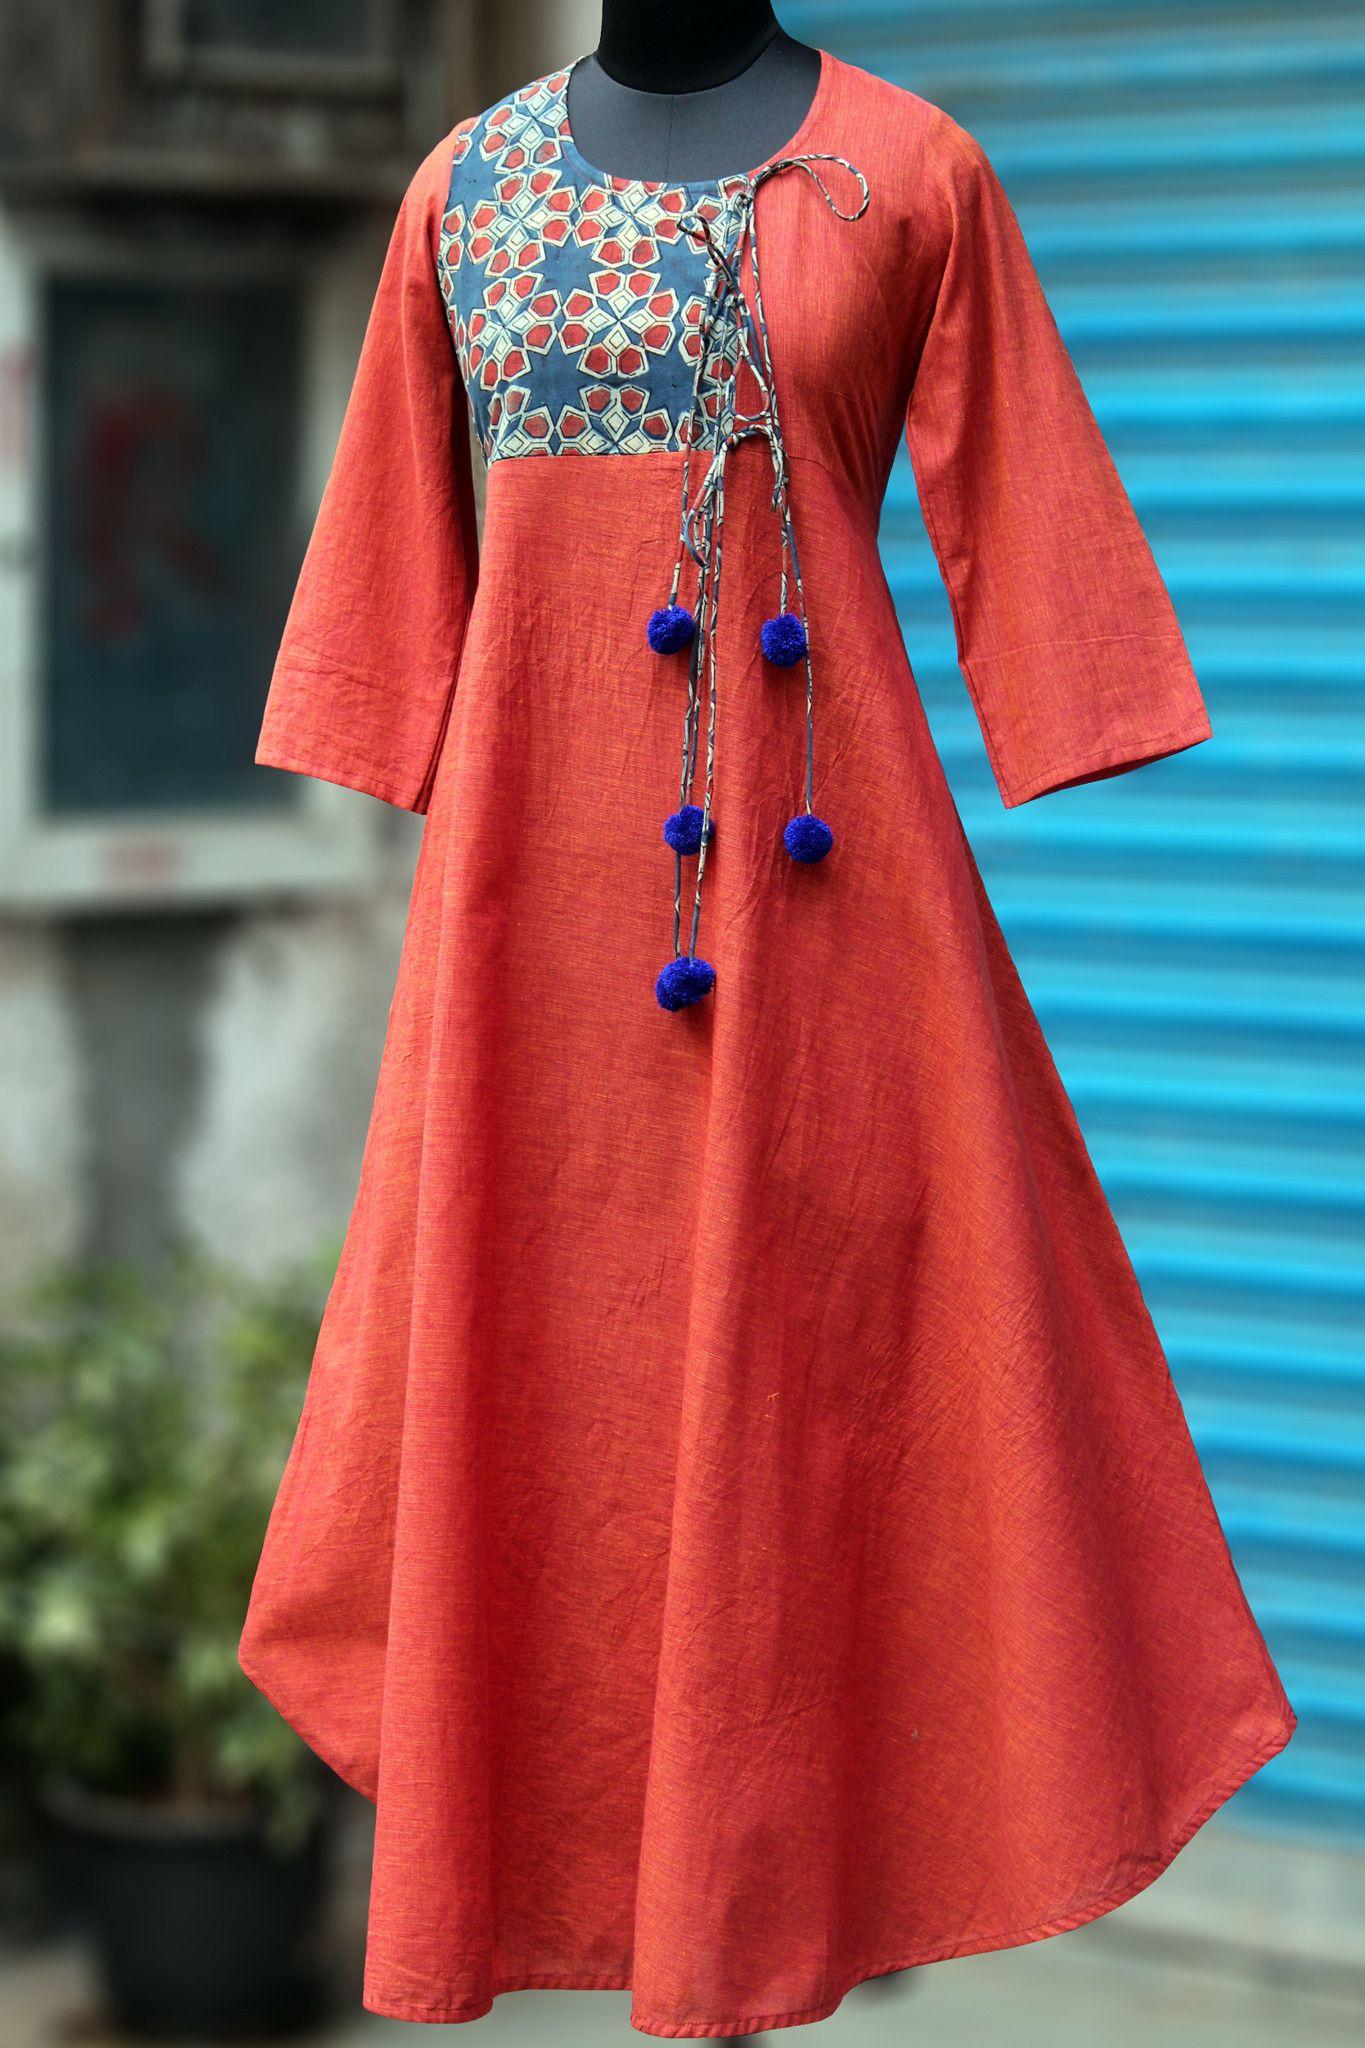 Maati Crafts Red Cotton Anghrakha Kurti Women S Kurti